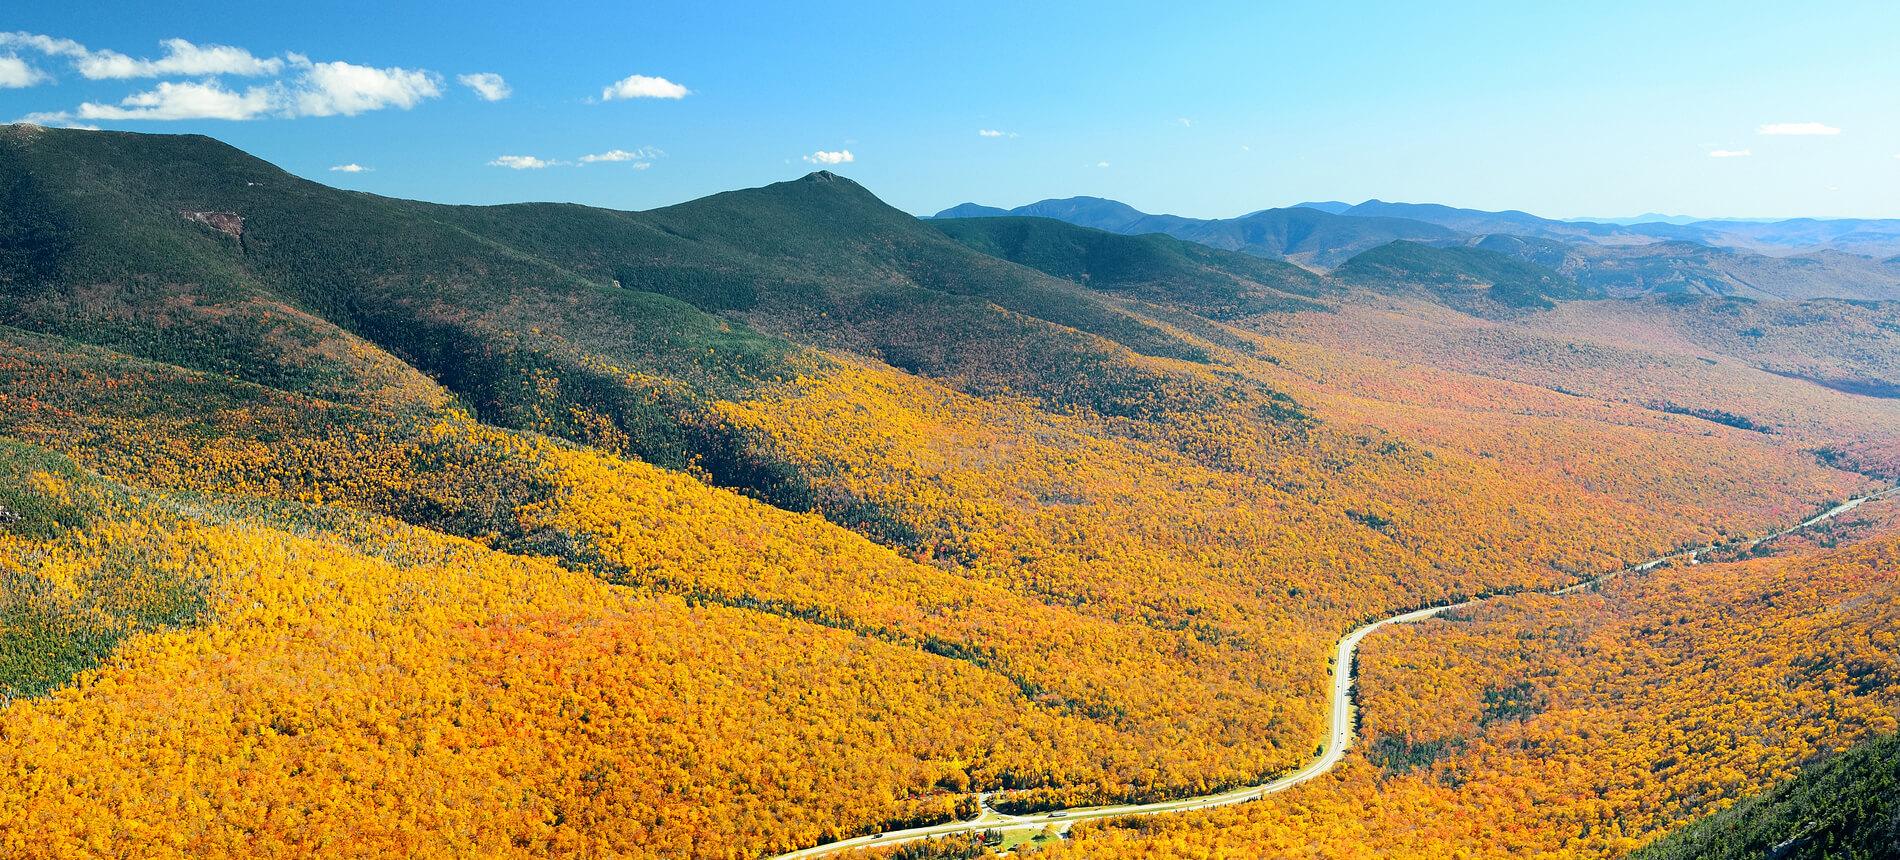 The White Mountains 100 Mile Challenge